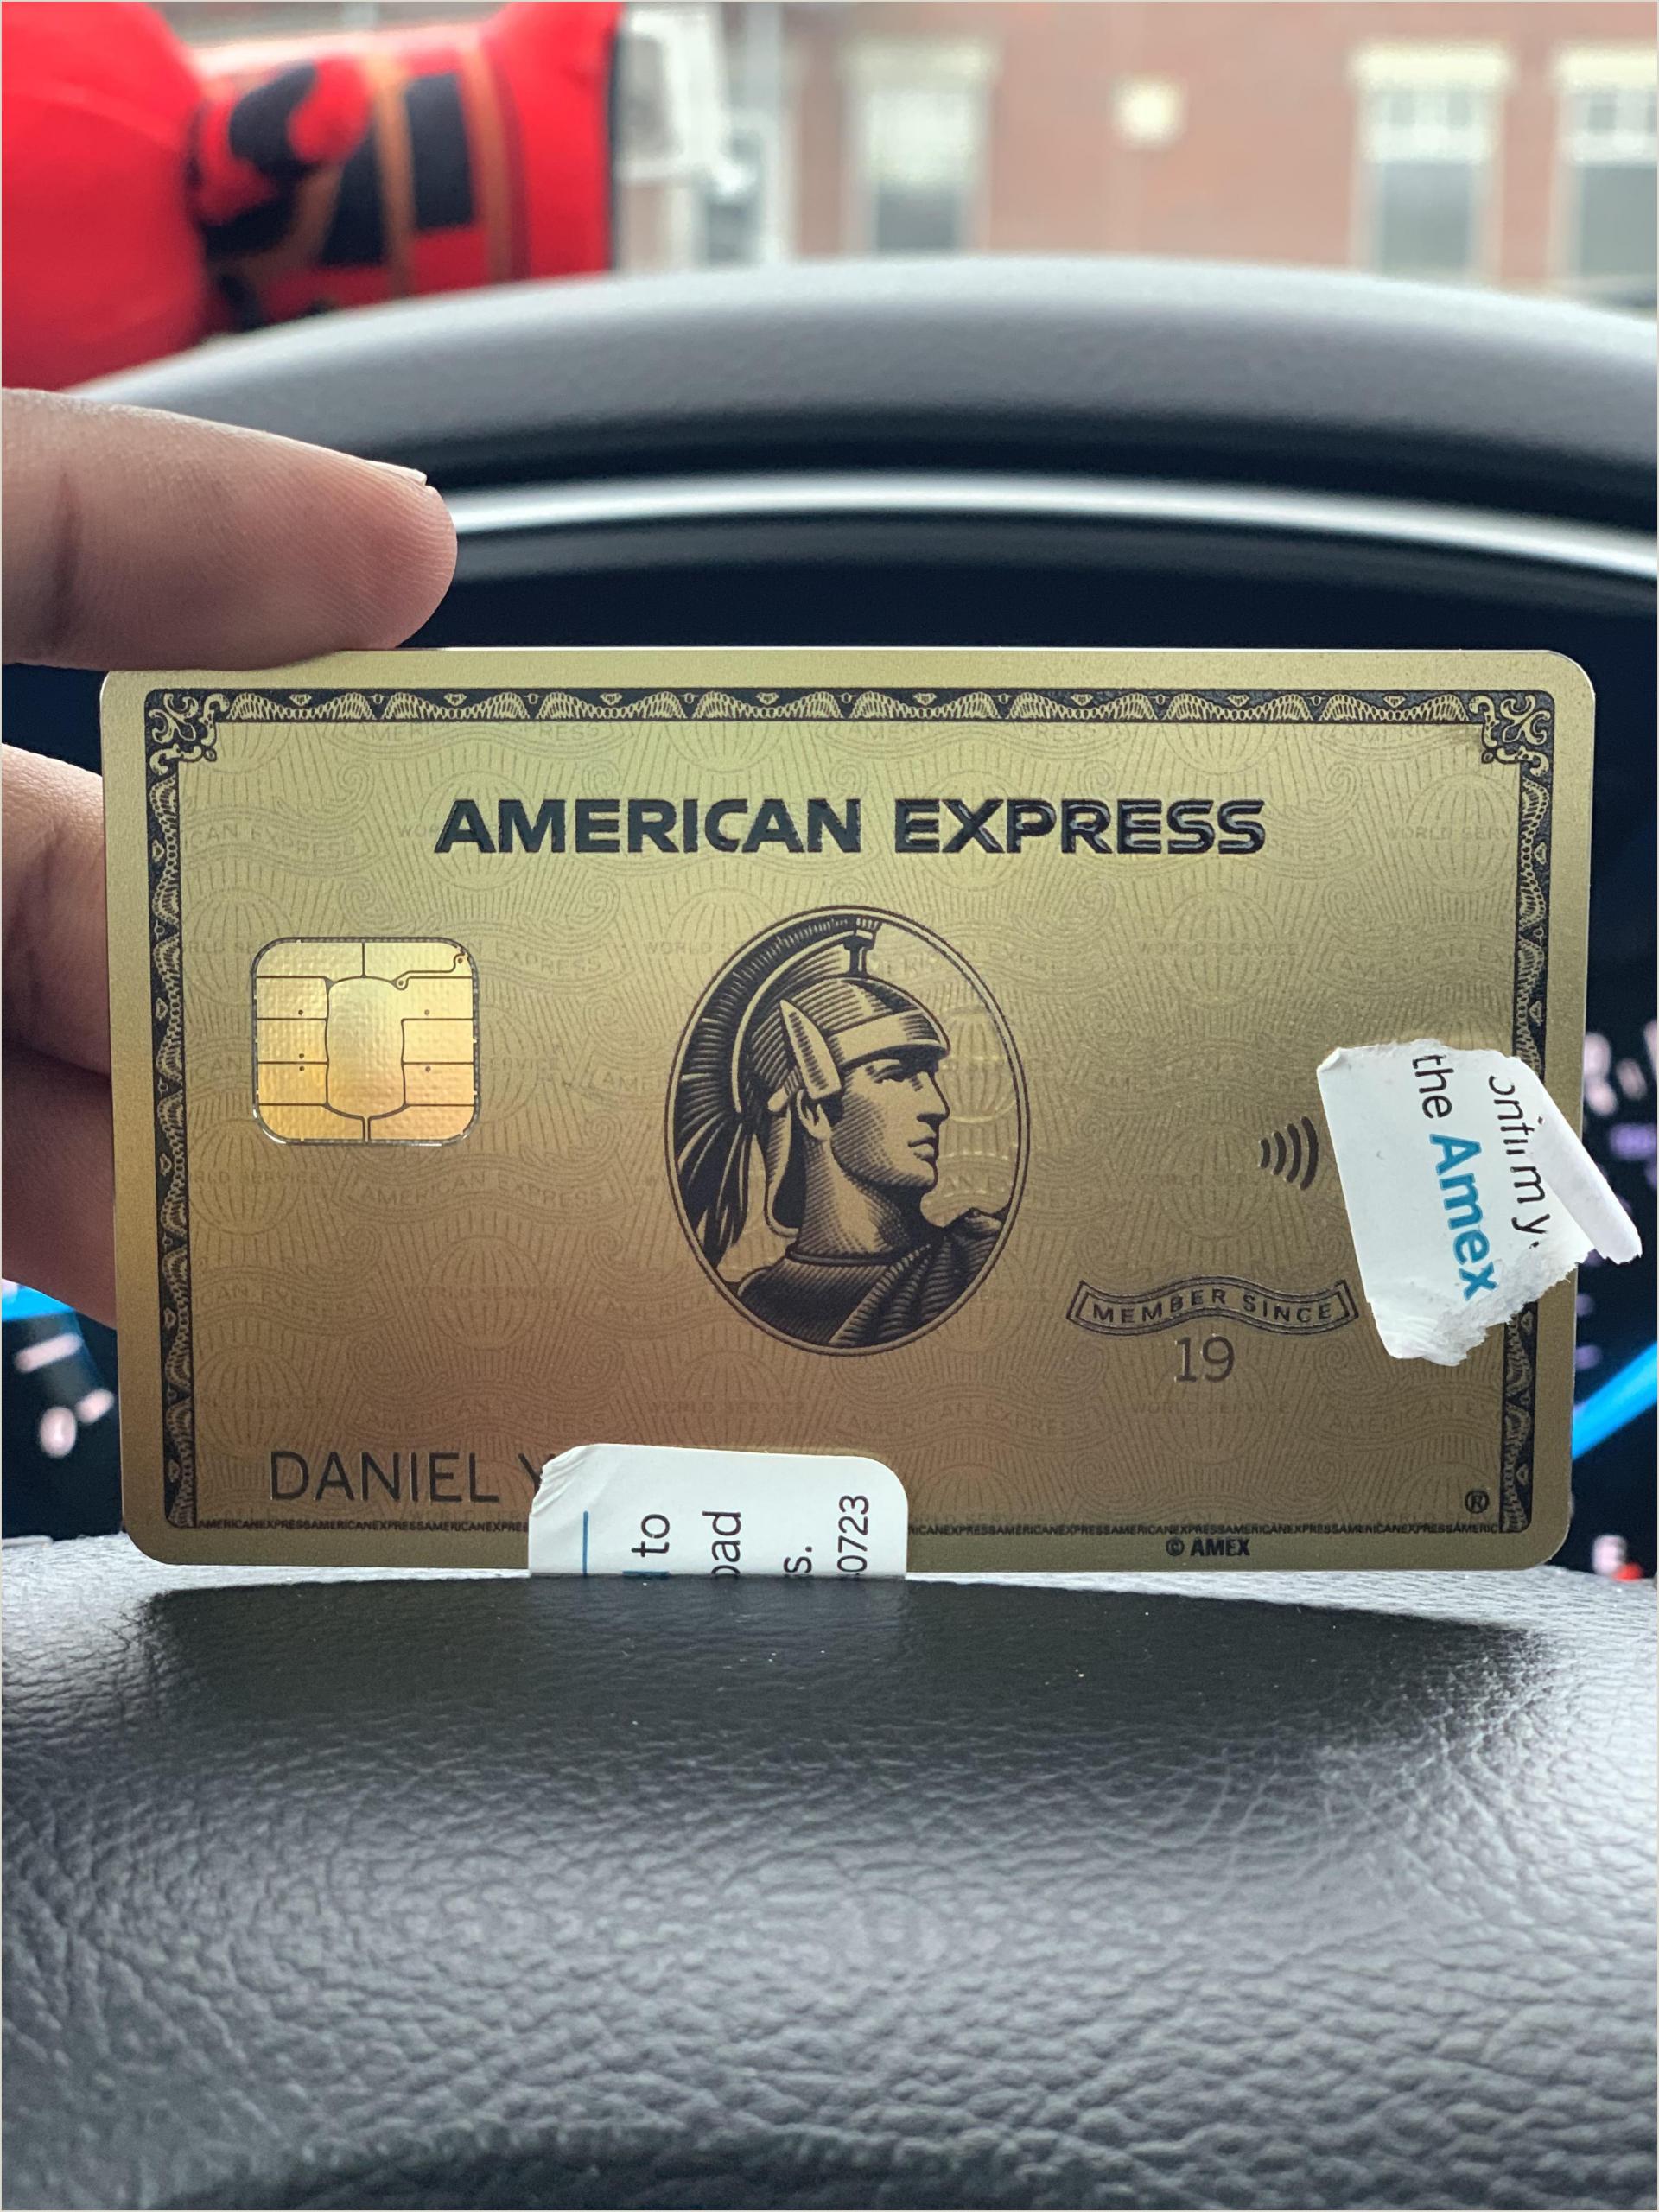 Best Business Cards Reddit Best Travel Credit Card No Annual Fee Reddit